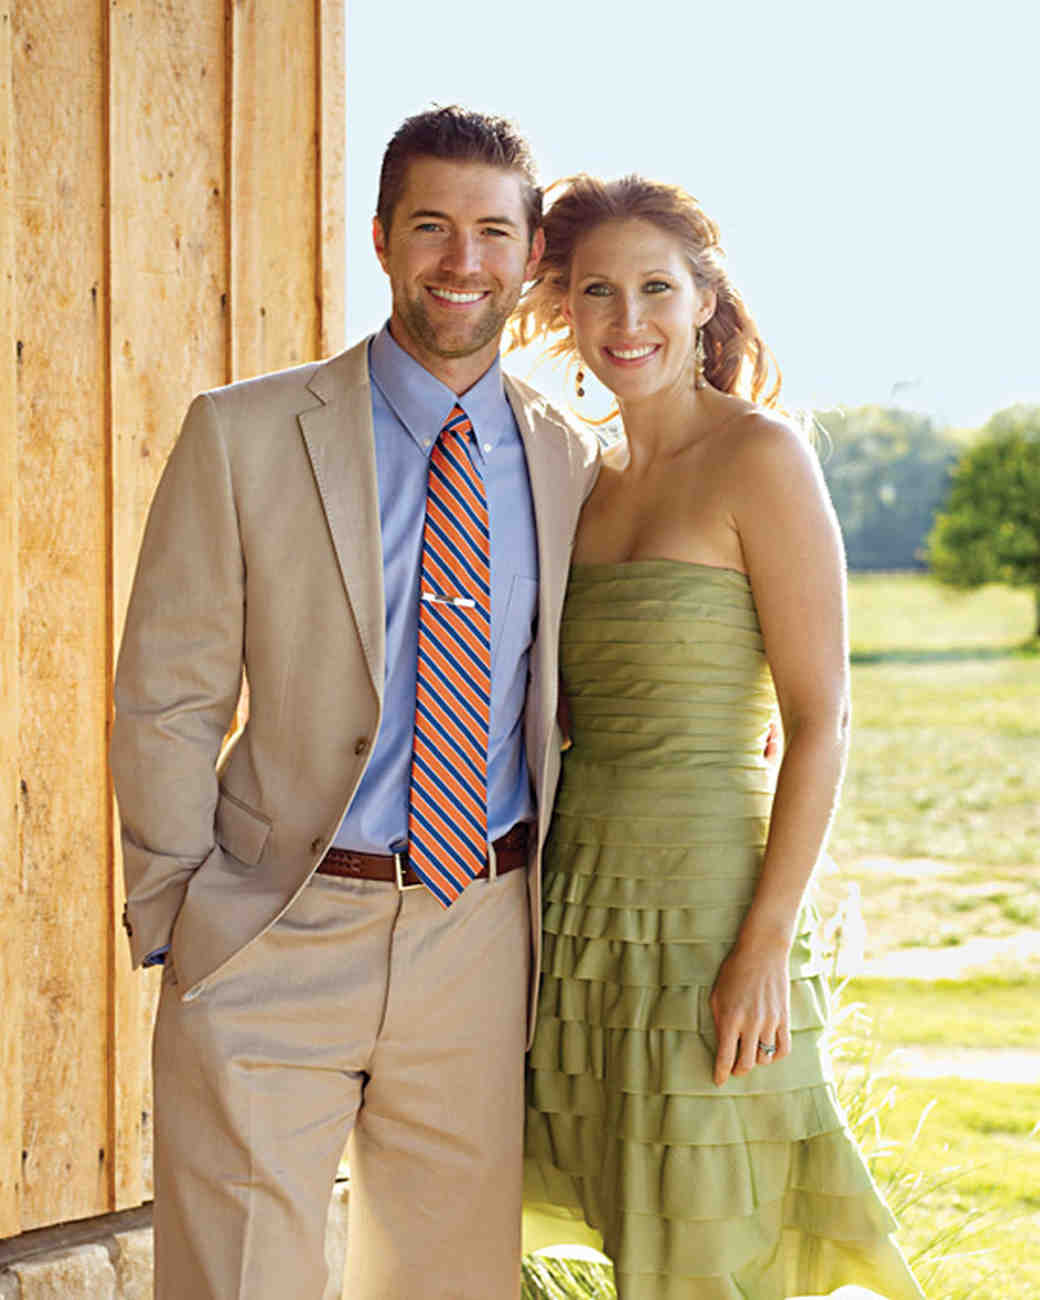 Formal dress for wedding ceremony